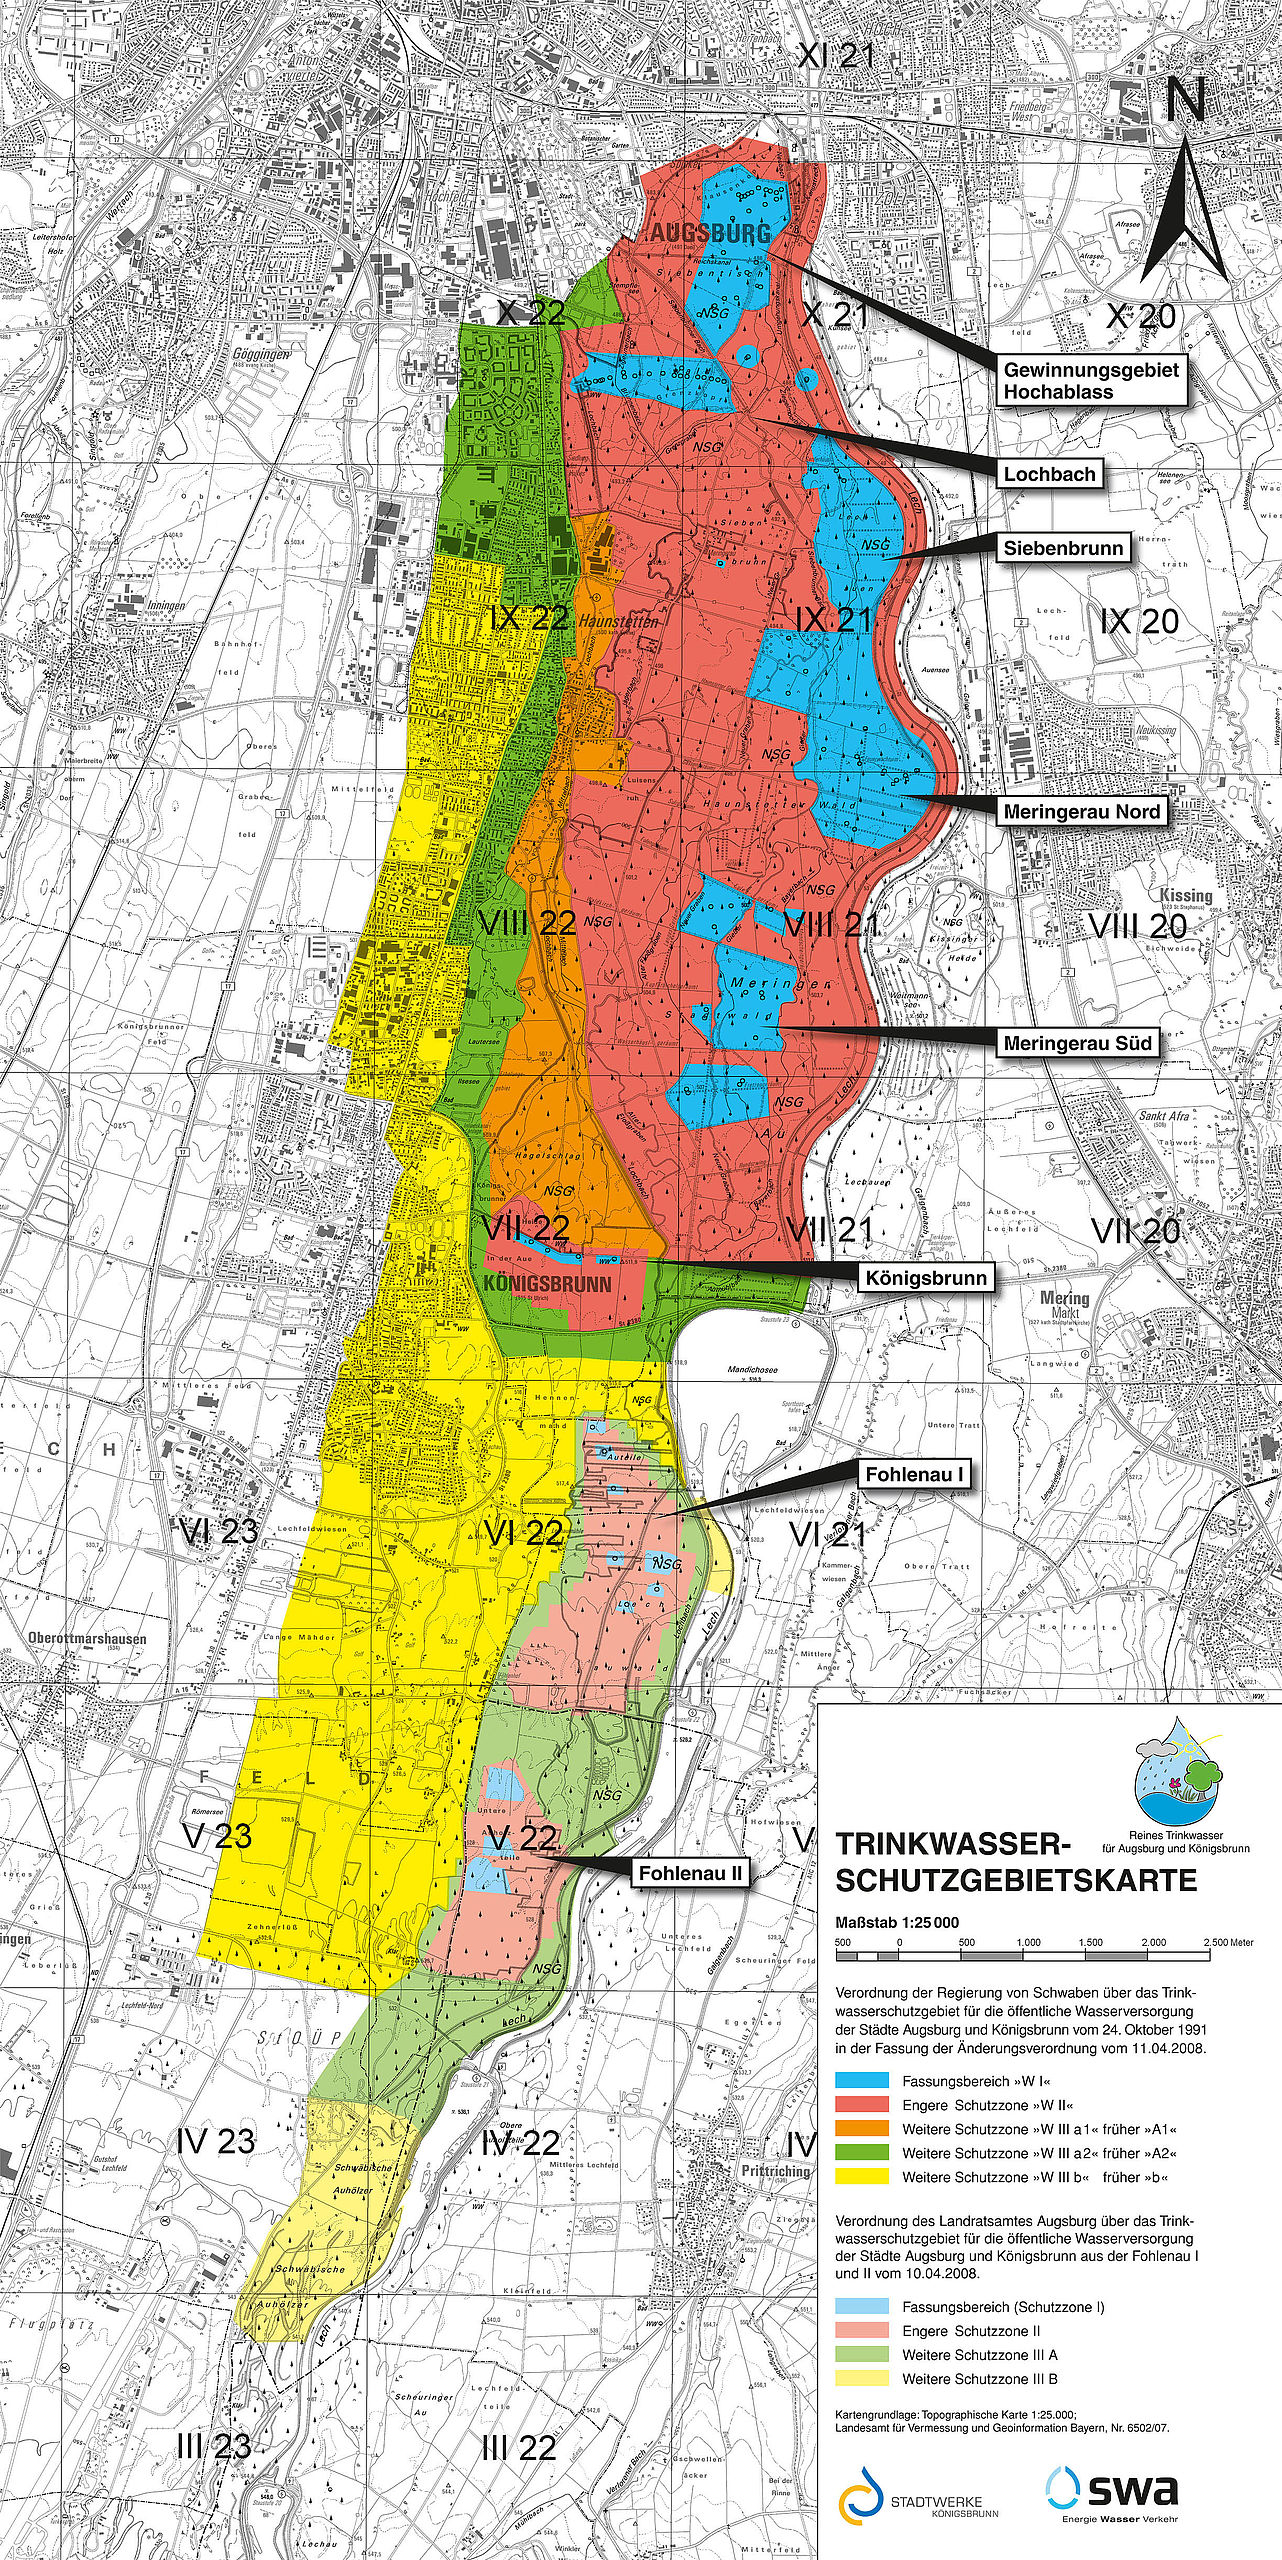 Karte Augsburg.Swa Trinkwasser Stadtwerke Augsburg Swa